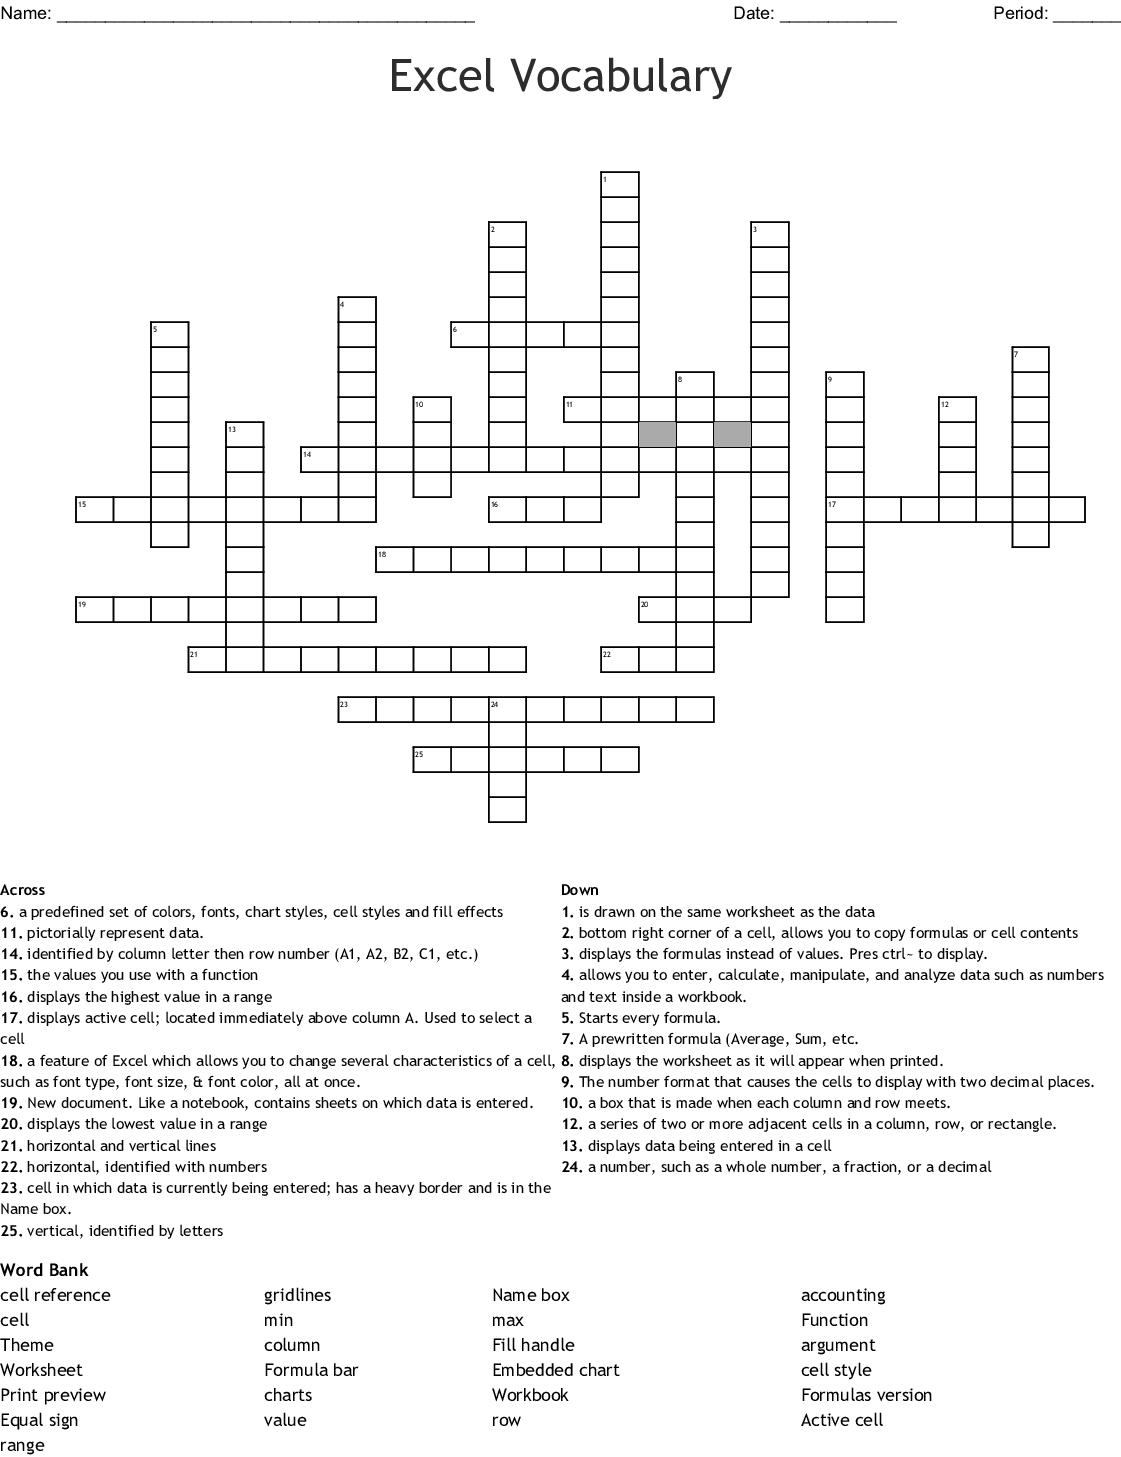 Microsoft Excel Vocabulary Words Crossword